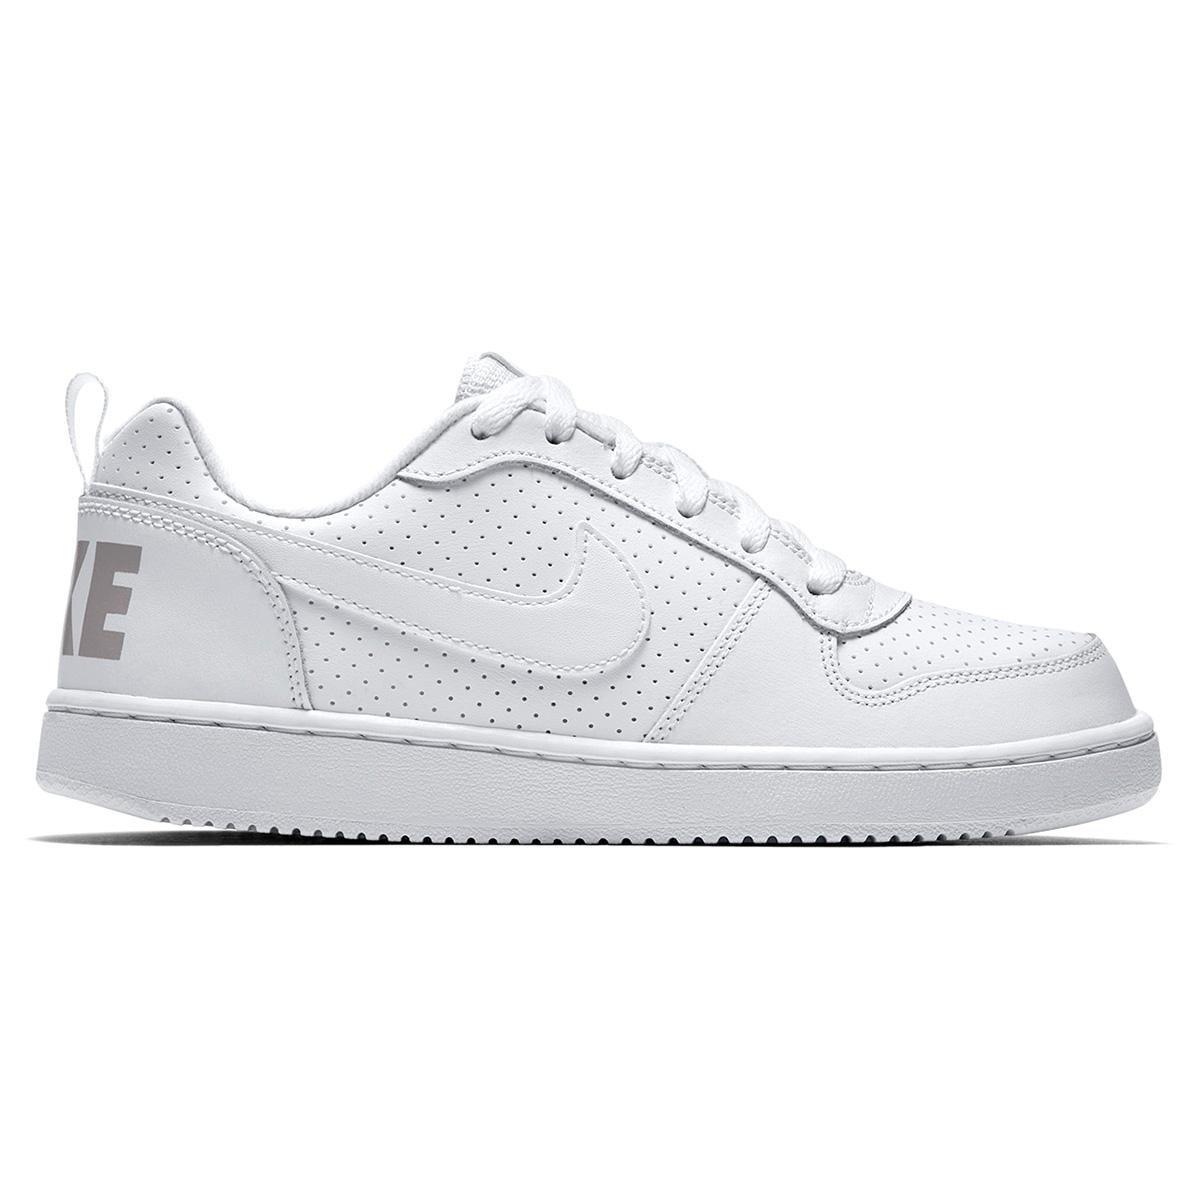 58409453bc5 Tênis Infantil Nike Court Borough Low - Branco - Compre Agora